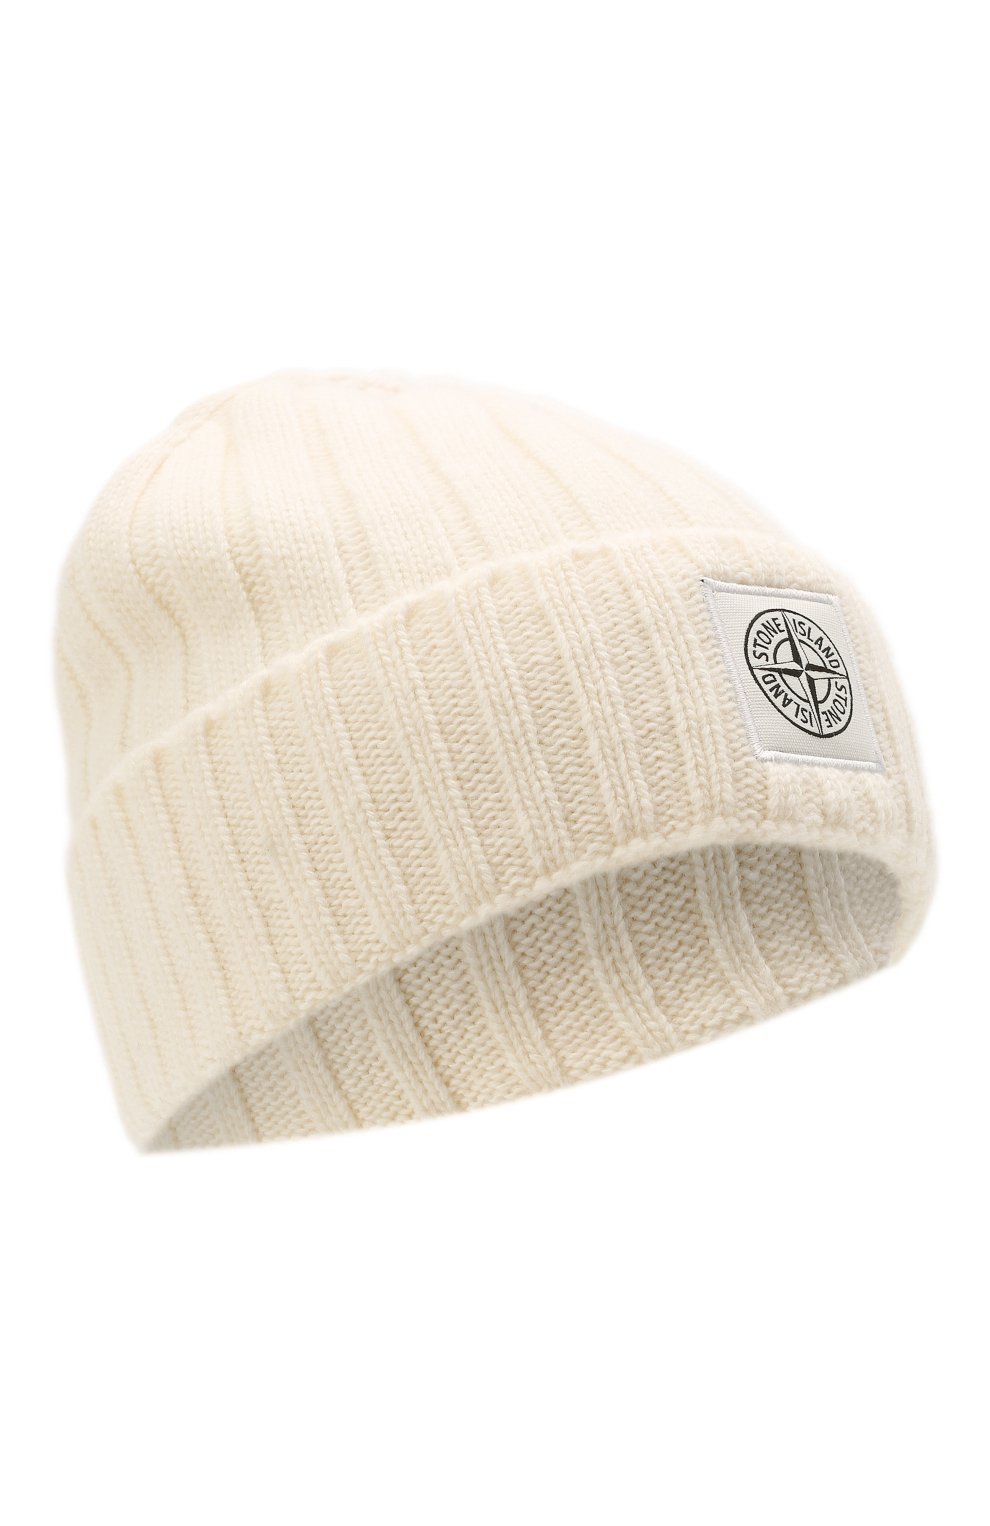 Мужская шерстяная шапка STONE ISLAND белого цвета, арт. 7515N24B5   Фото 1 (Материал: Шерсть; Кросс-КТ: Трикотаж)